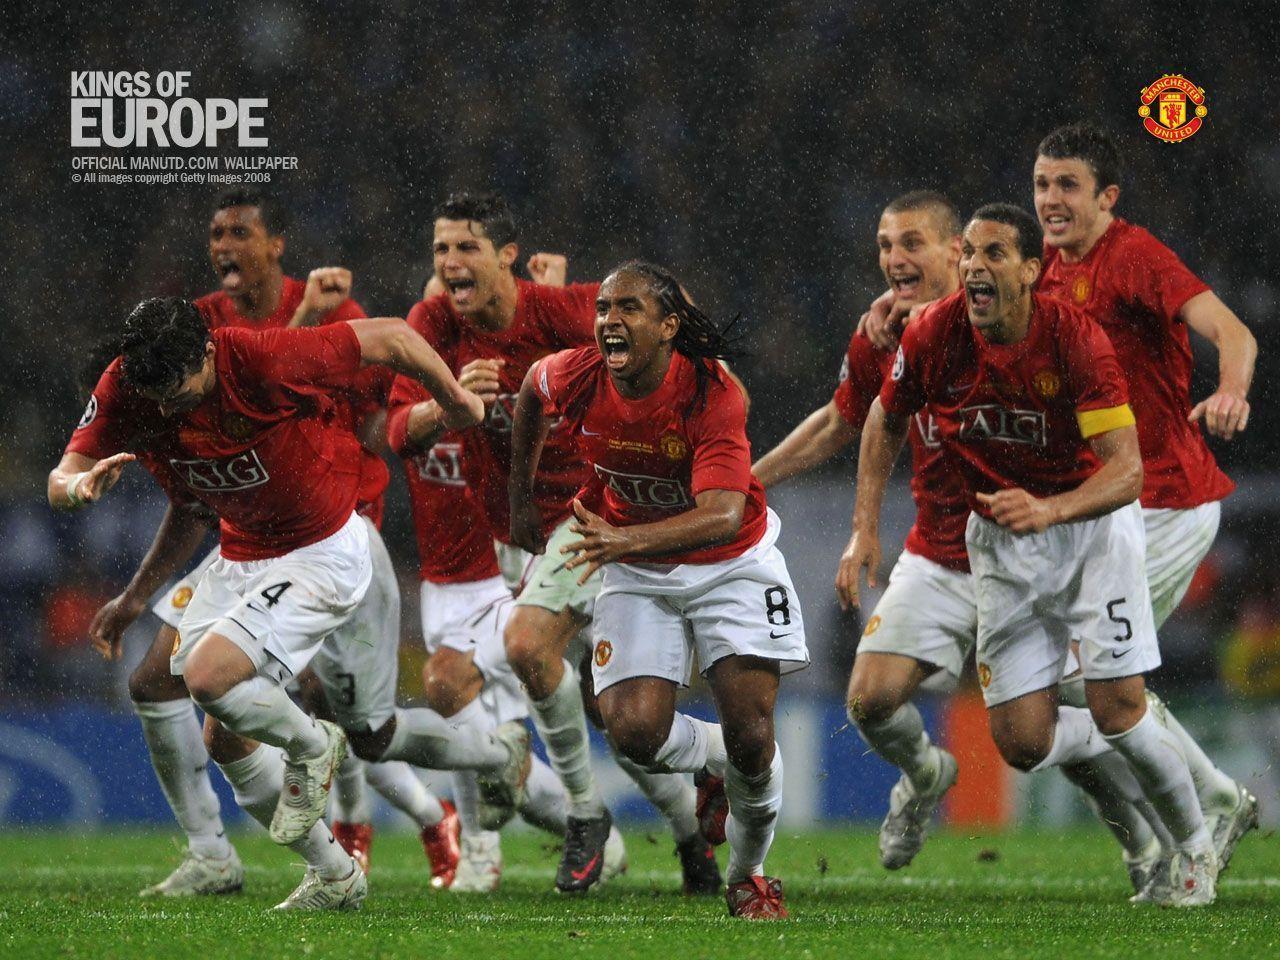 Man Utd 07/08 Wallpapers